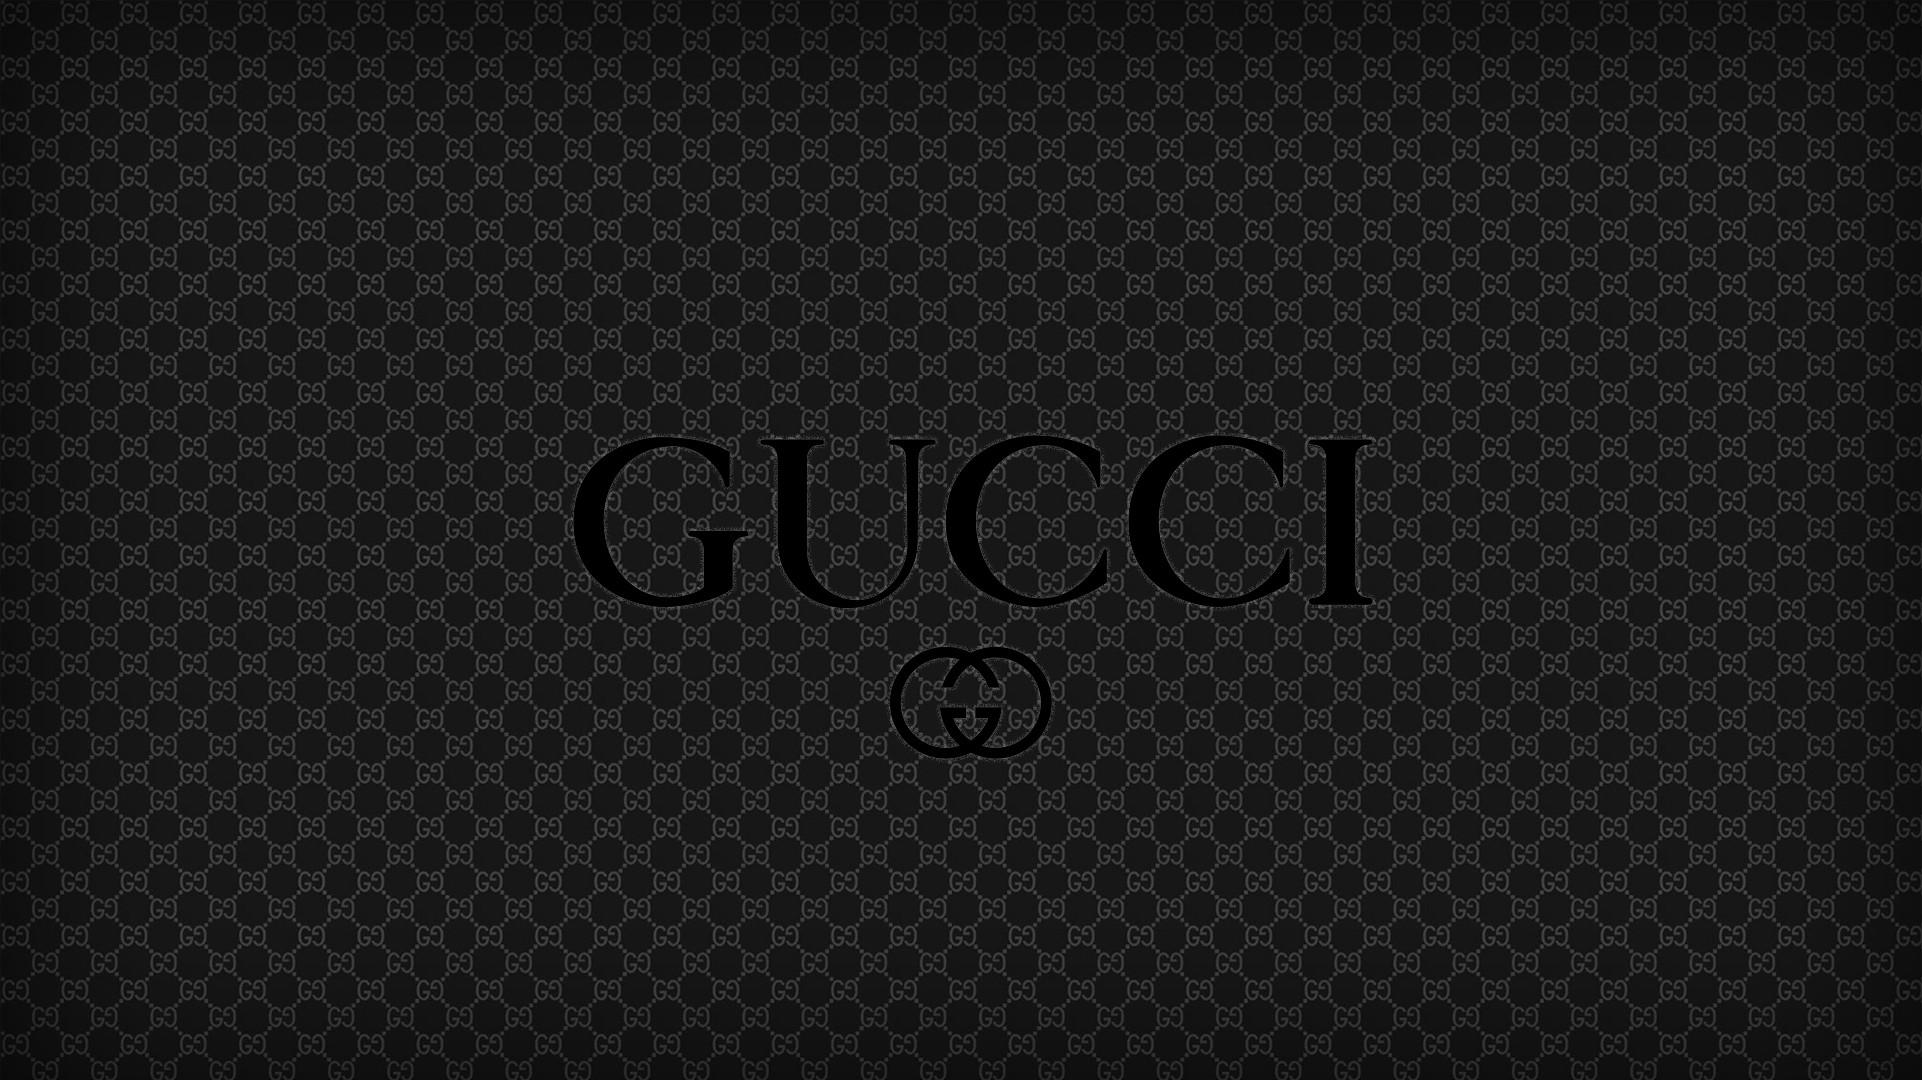 Gucci Wallpaper HD – WallpaperSafari